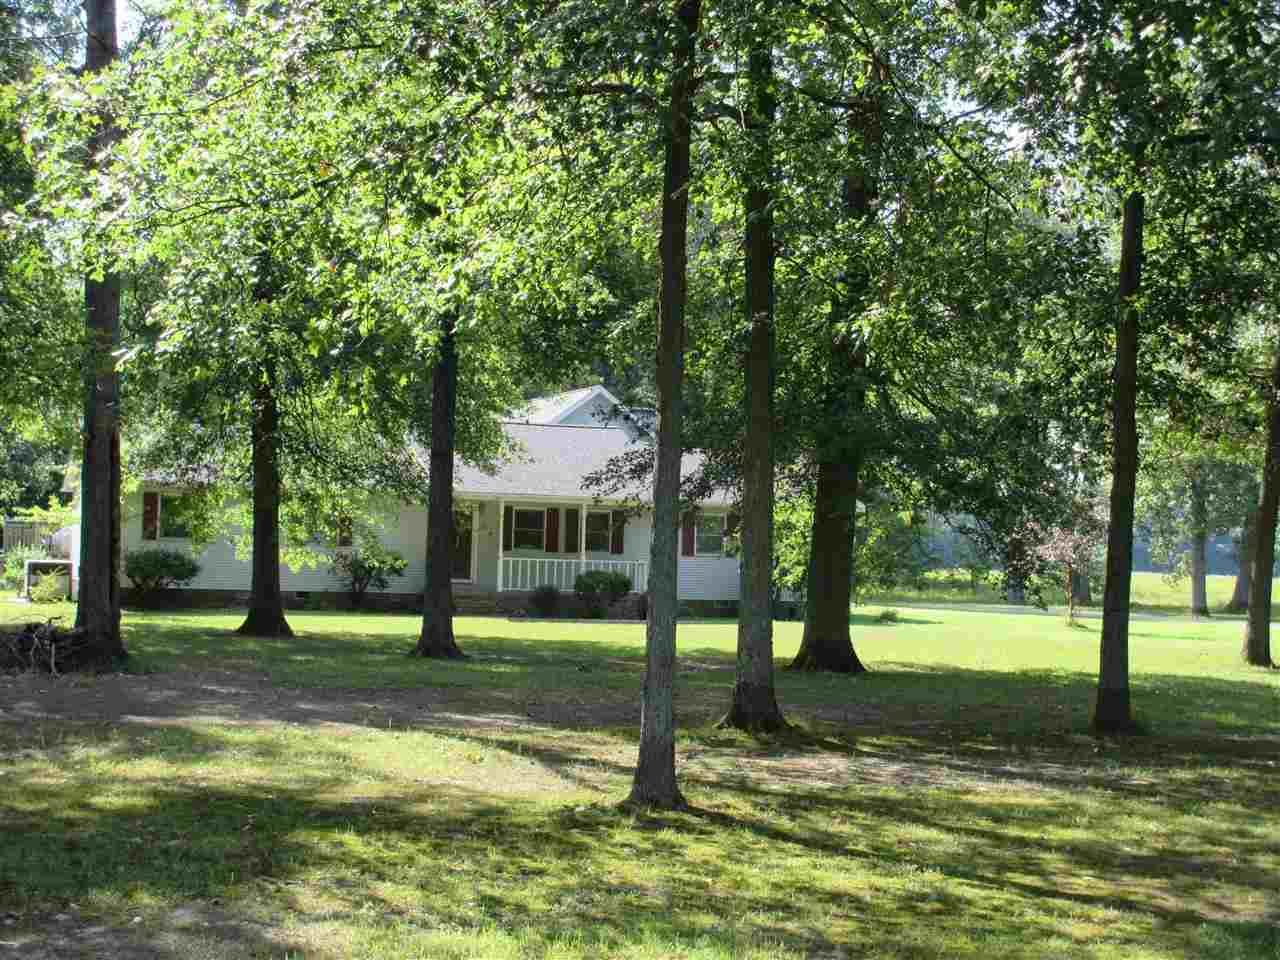 Real Estate for Sale, ListingId: 30711498, West Paducah,KY42086